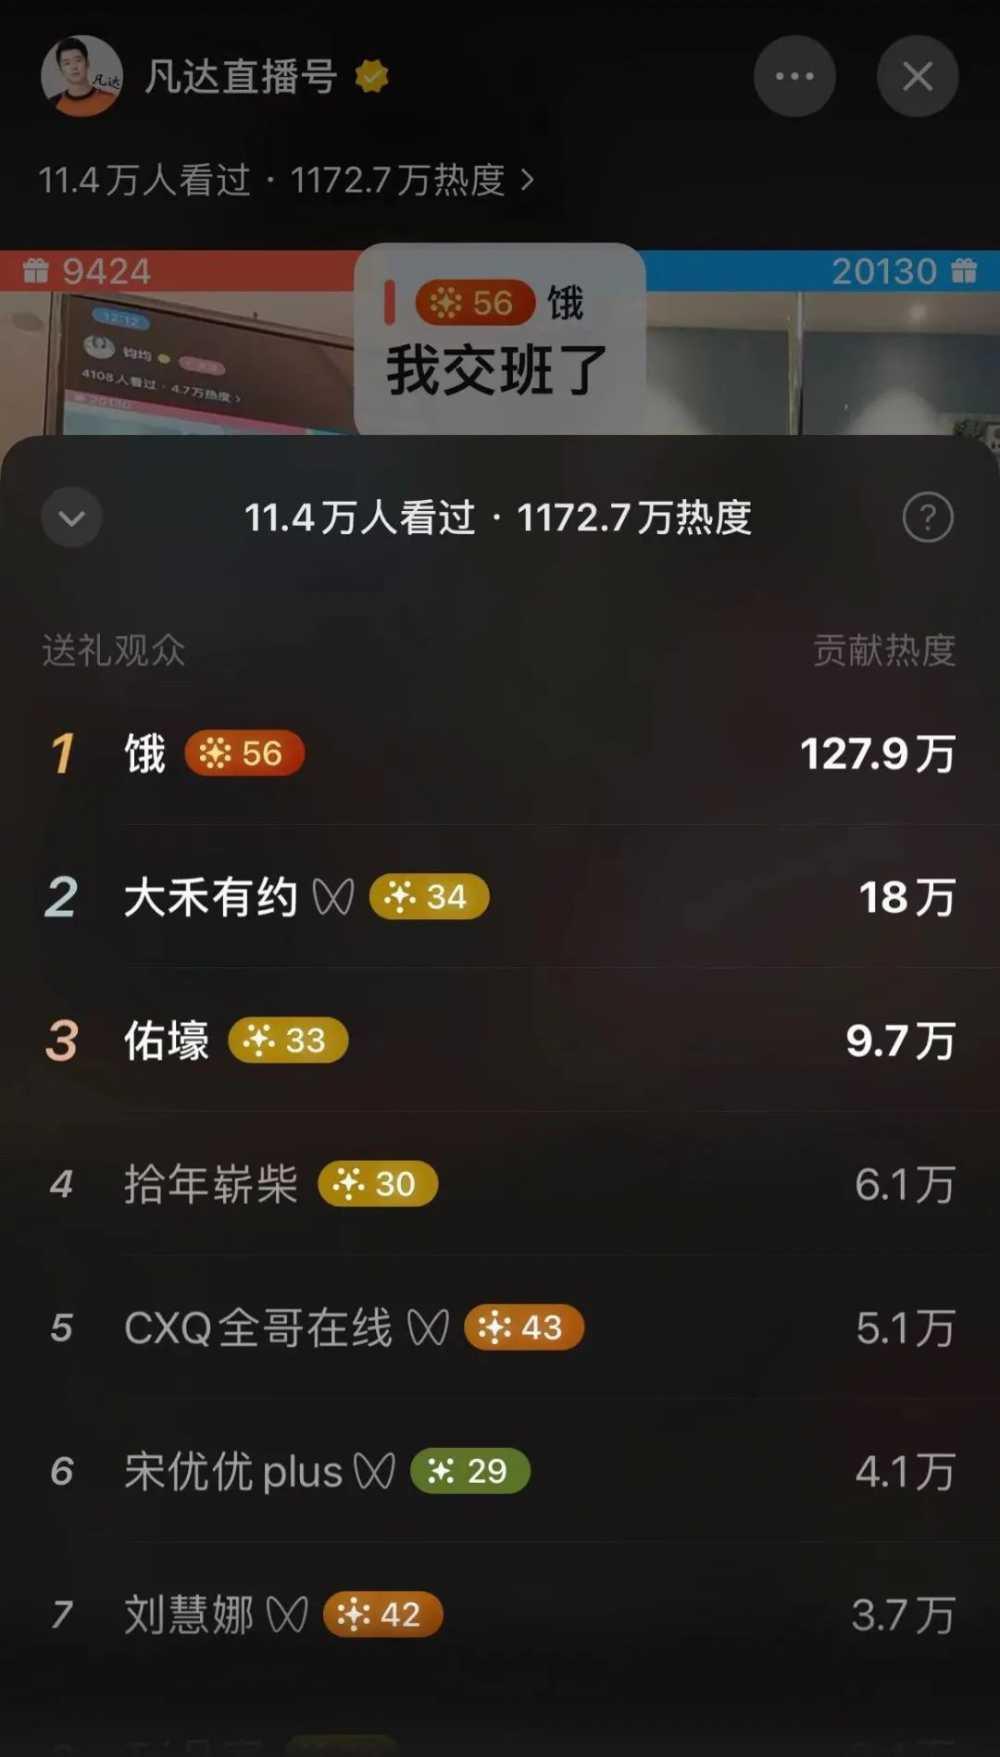 <a href='https://www.zhouxiaohui.cn'><a href='https://www.zhouxiaohui.cn/duanshipin/'>视频号</a></a>新增打赏分级等功能;人人视频下架-第3张图片-周小辉博客